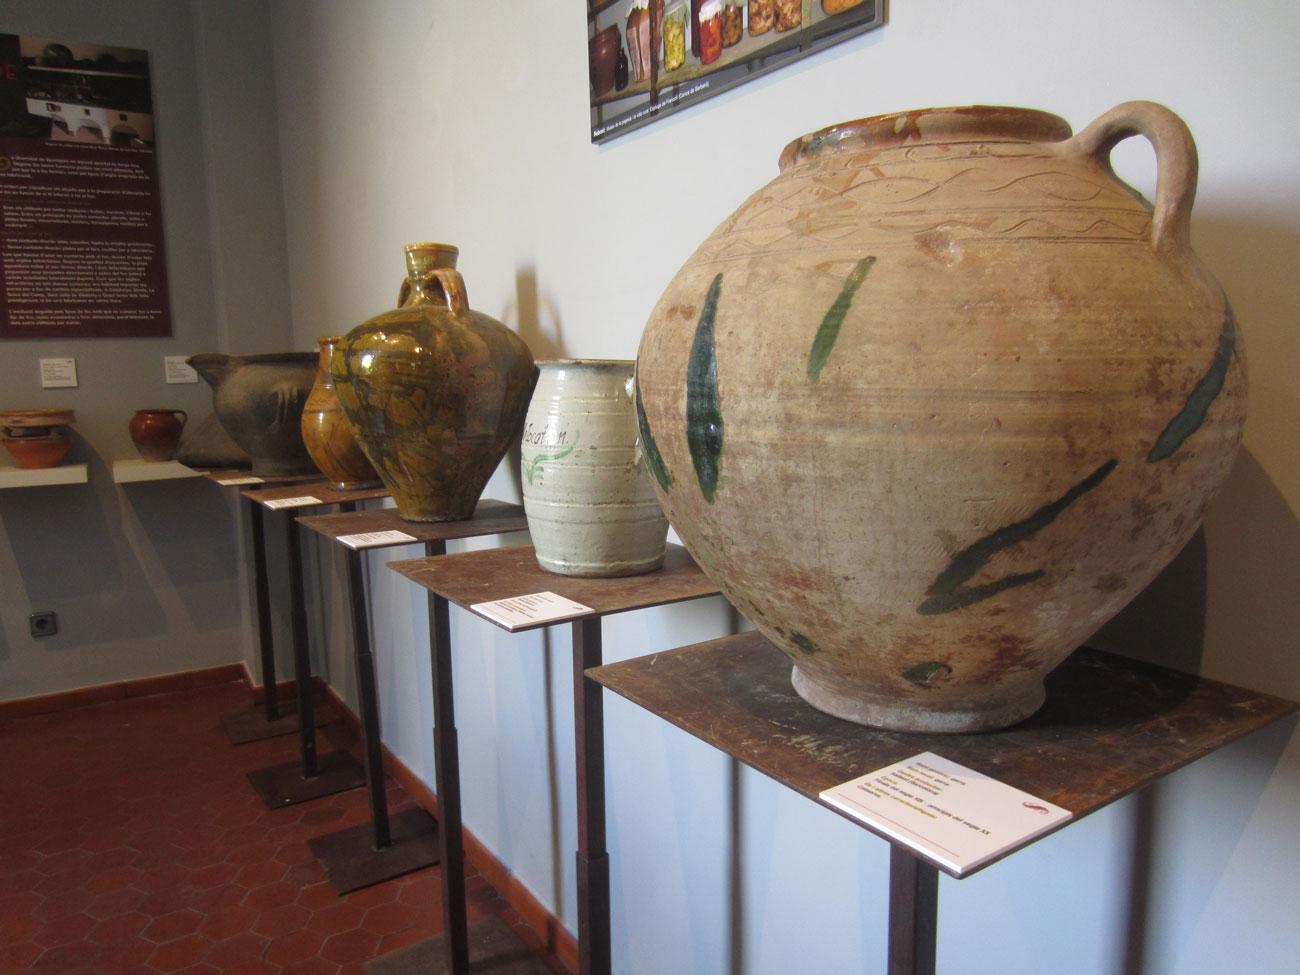 web-alfons-romero-casa-museu-cal-gerrer-fundacio-cabanas-78429